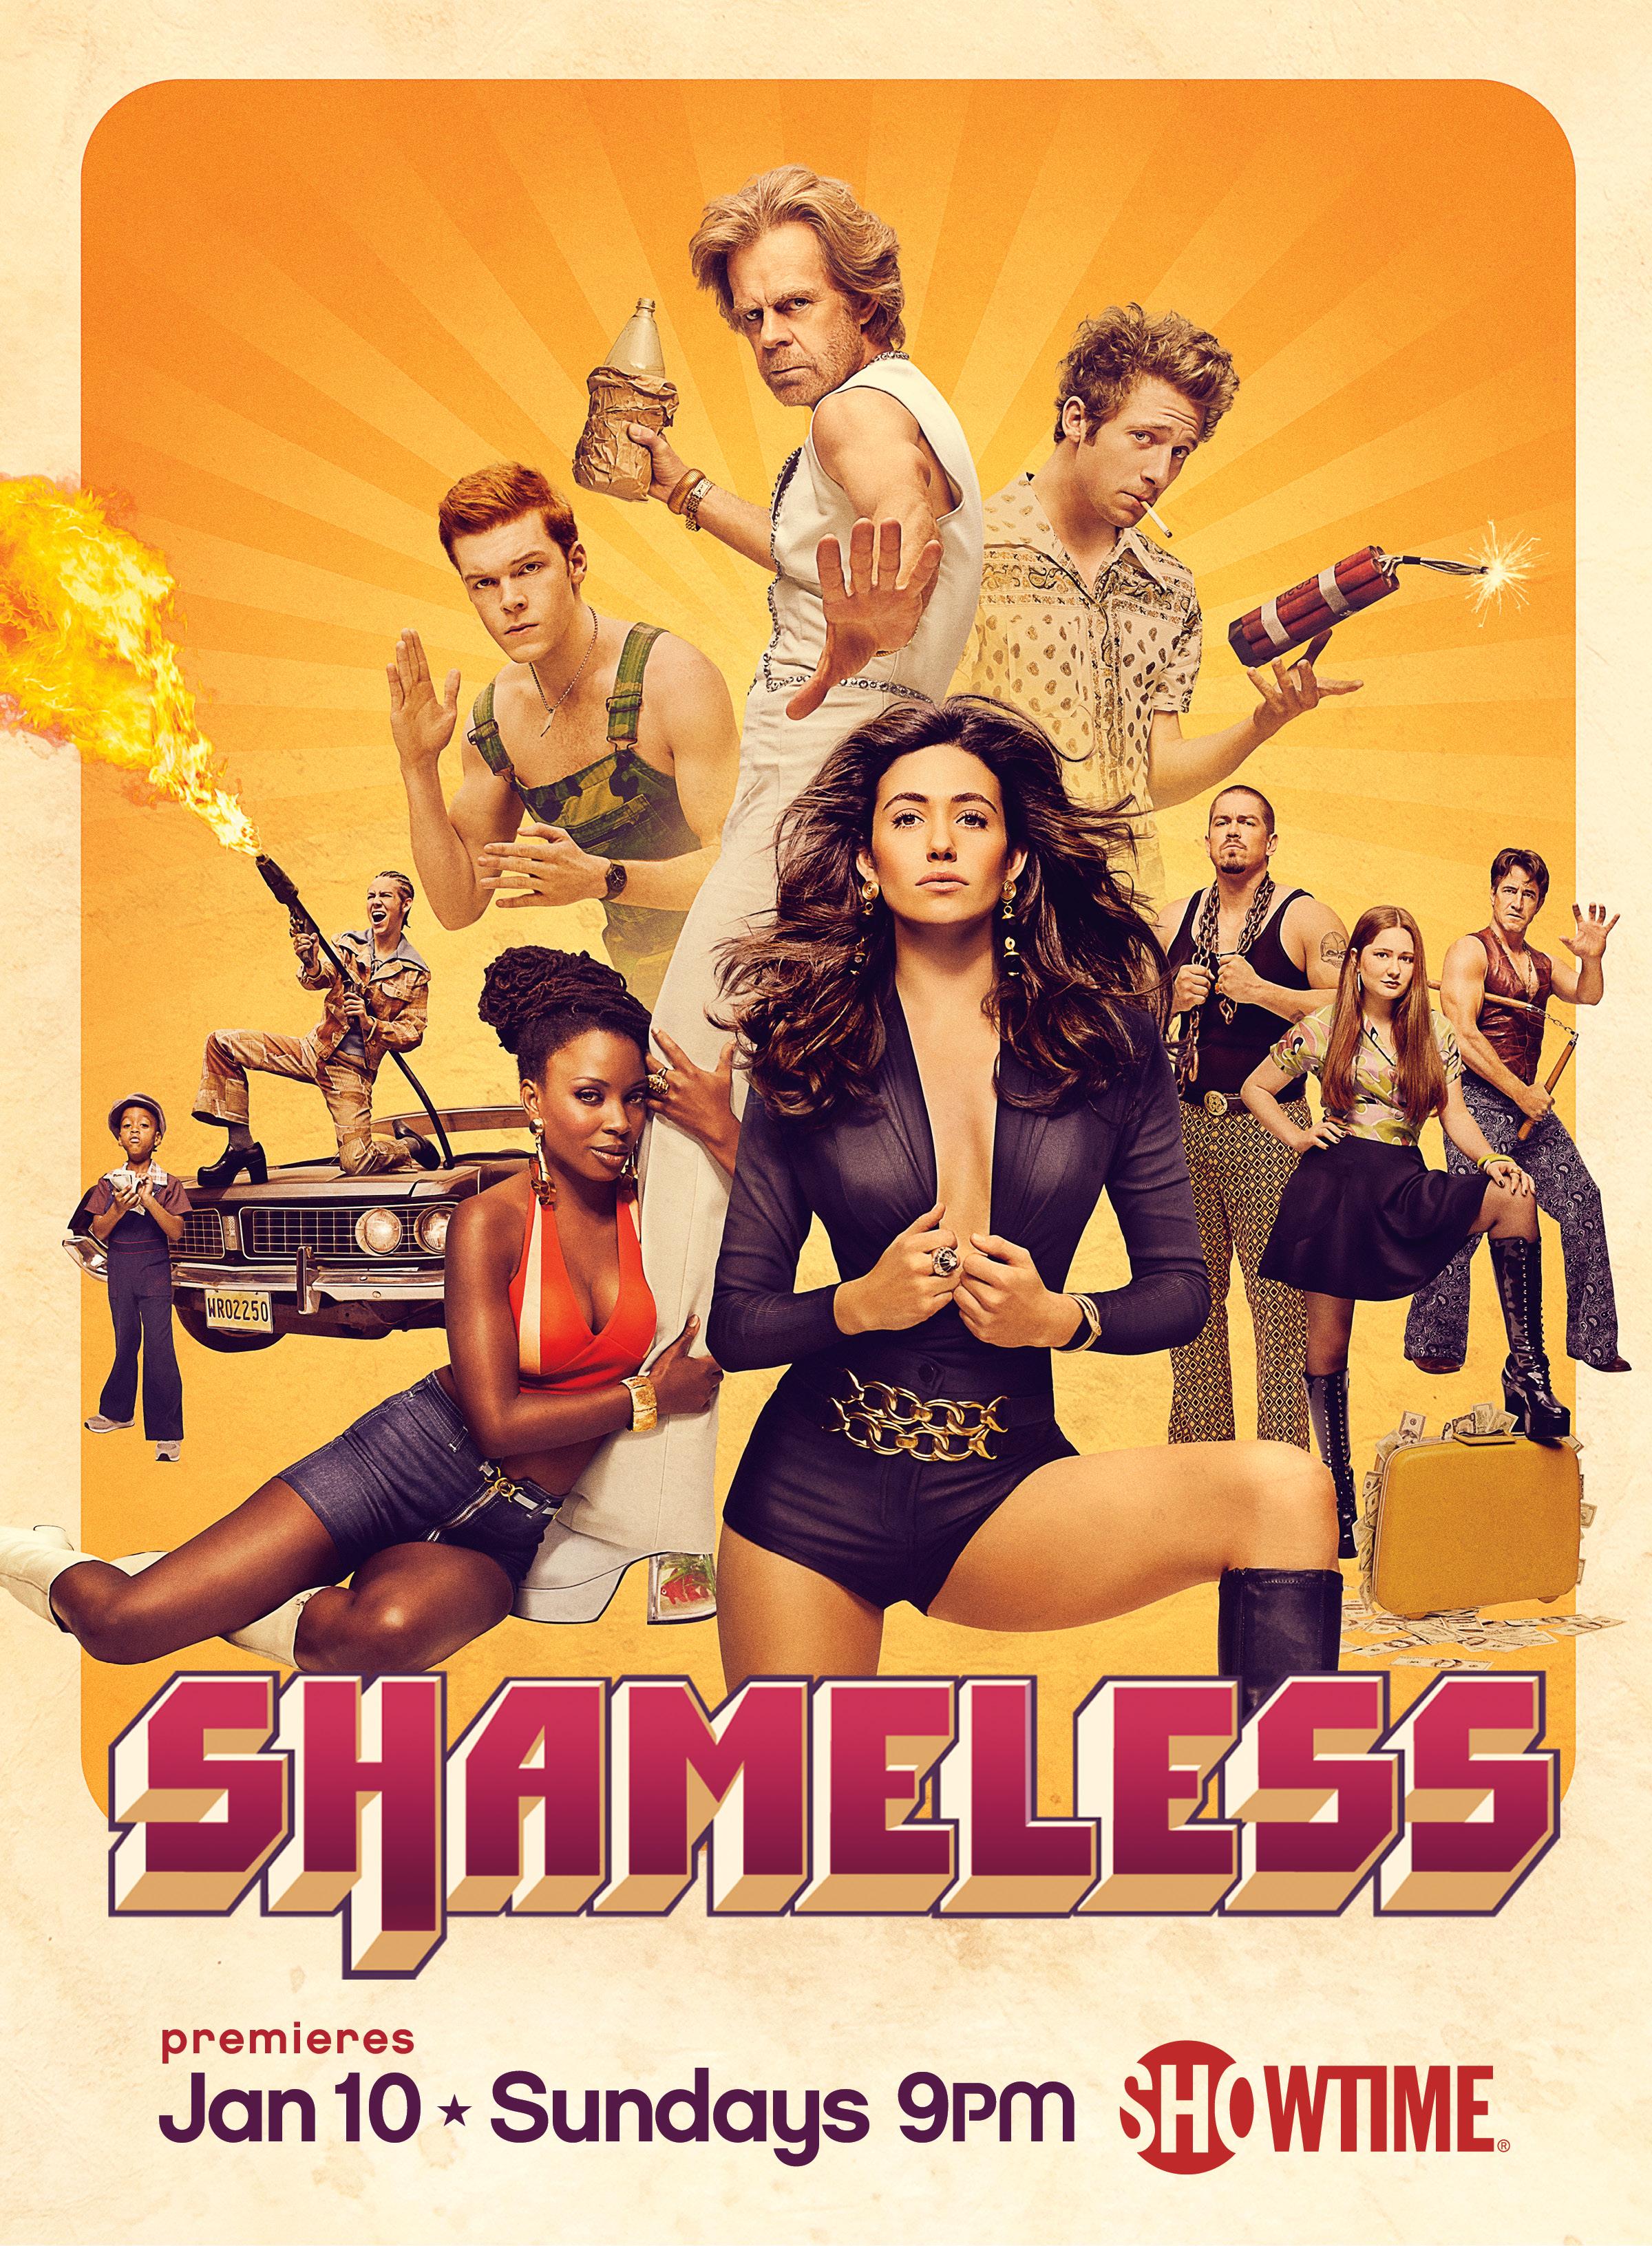 kép:https://tvseriesfinale.com/wp-content/uploads/2015/10/Shameless-Showtime-Season-6.jpg